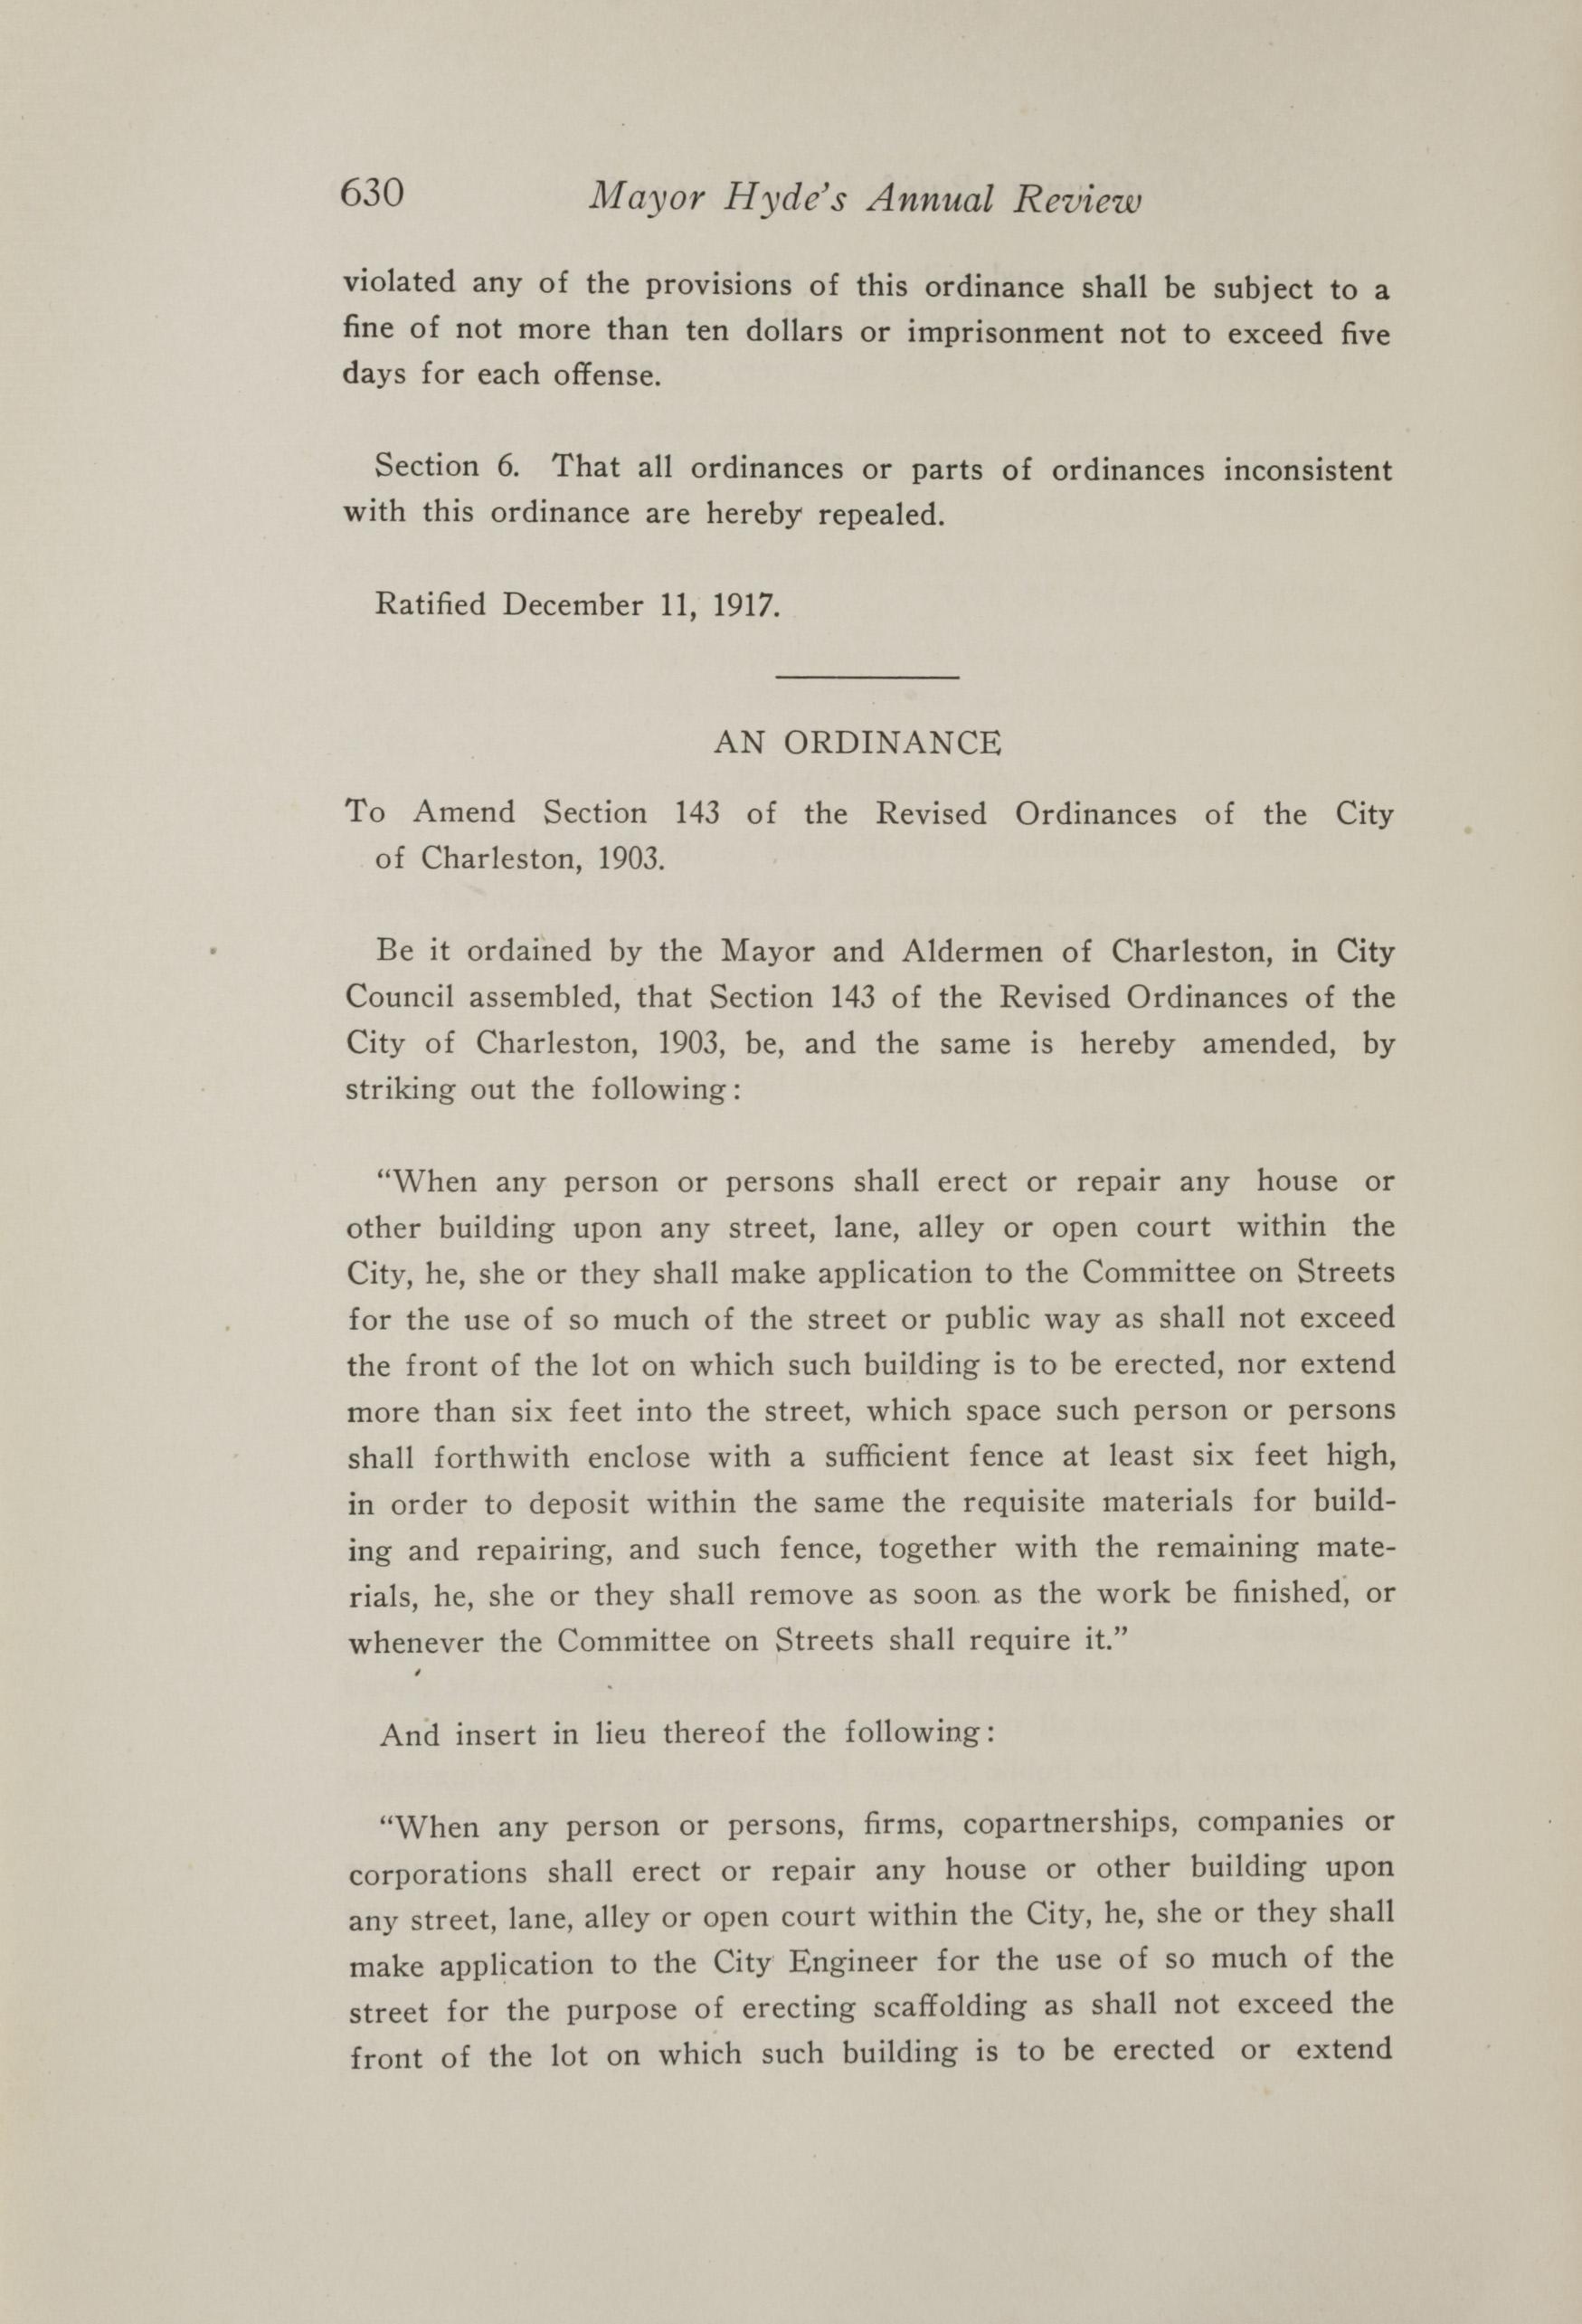 Charleston Yearbook, 1917, page 630